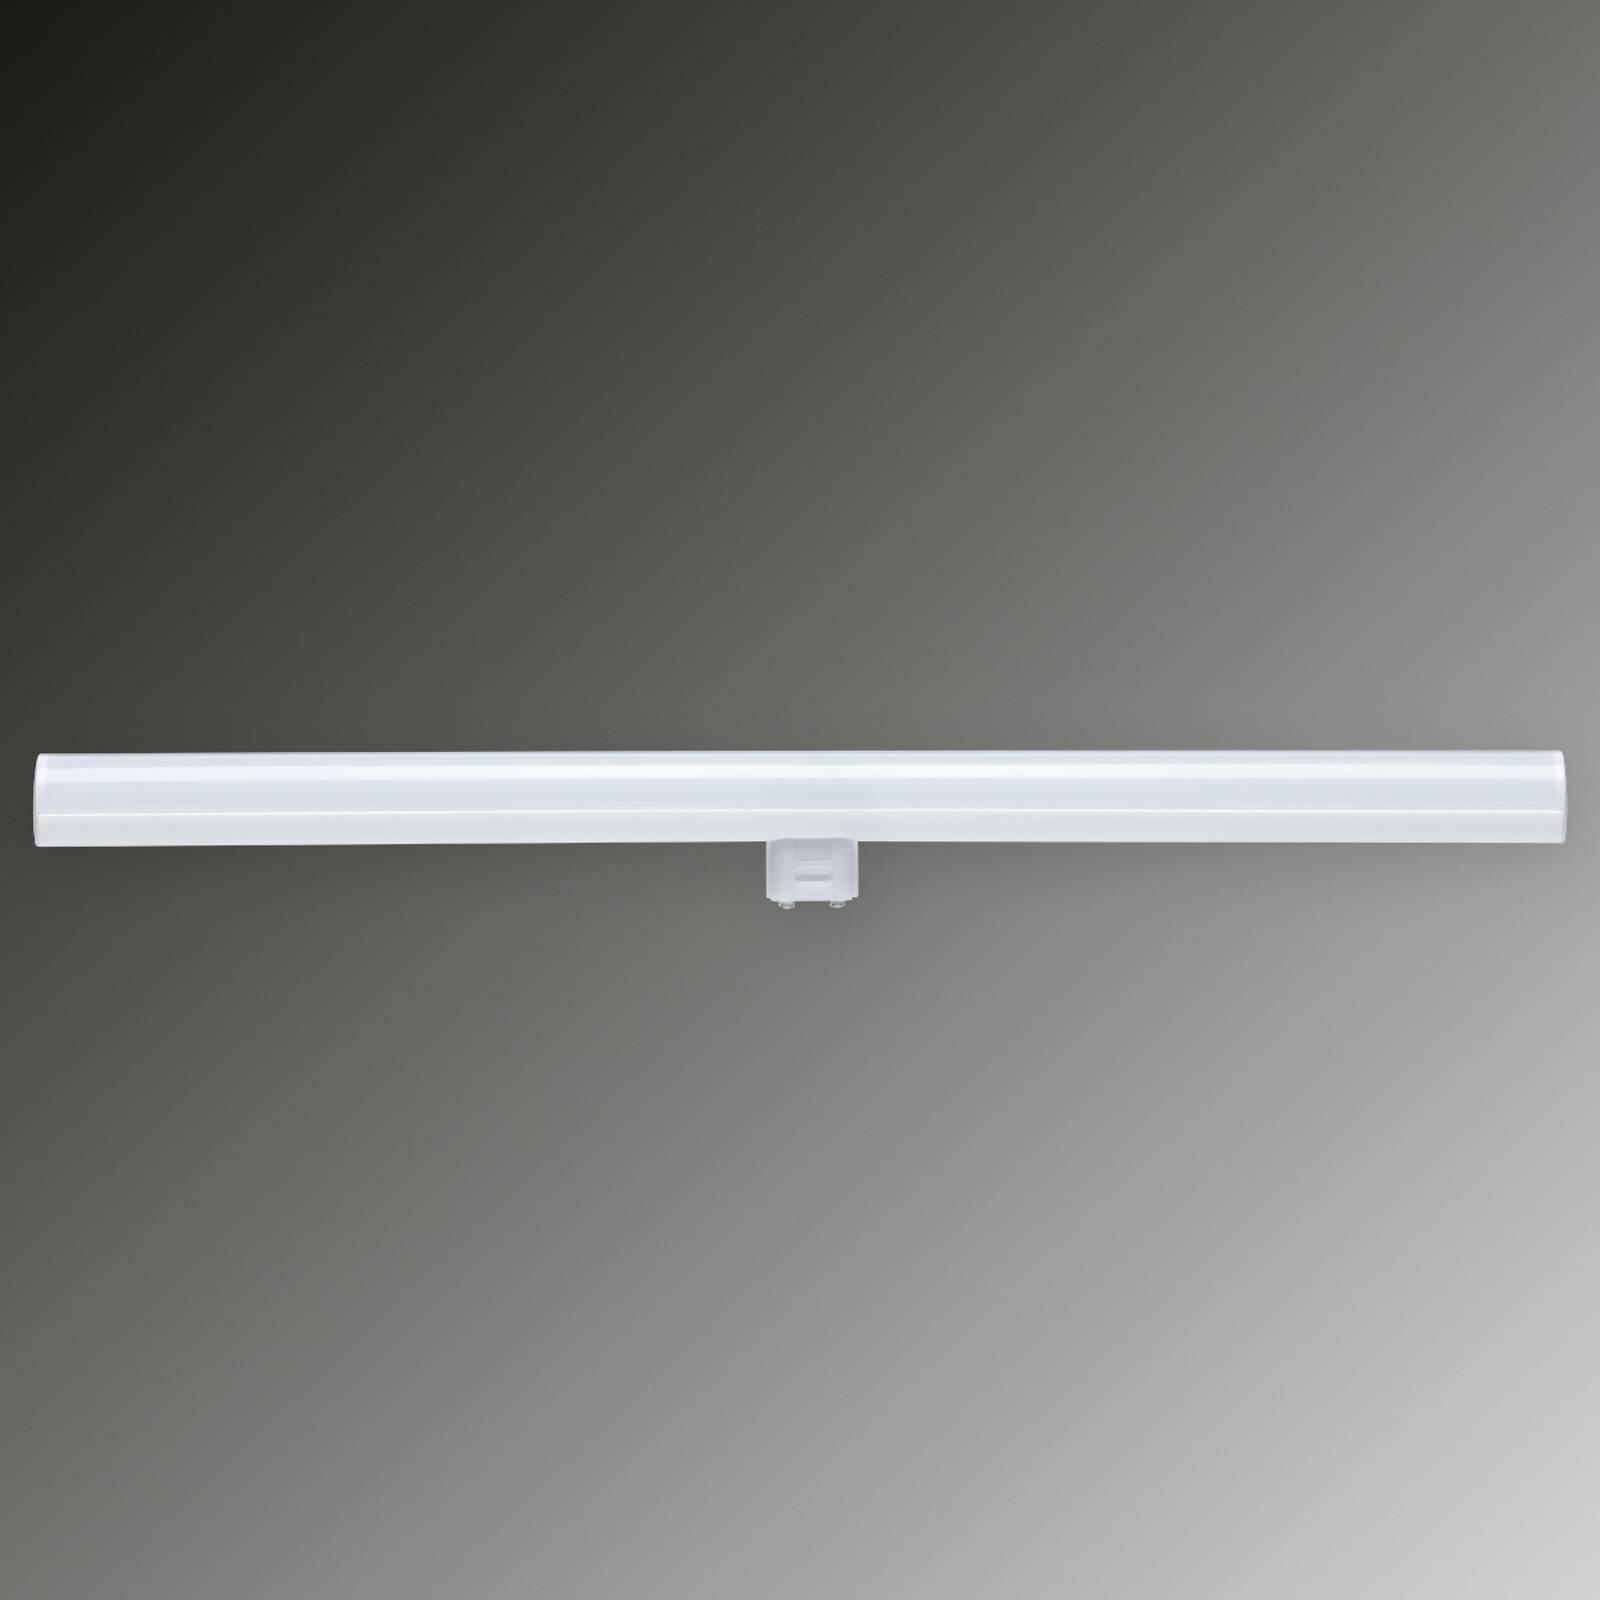 S14d 6,5 W 827 Yksikantainen LED-putkilamppu 500mm